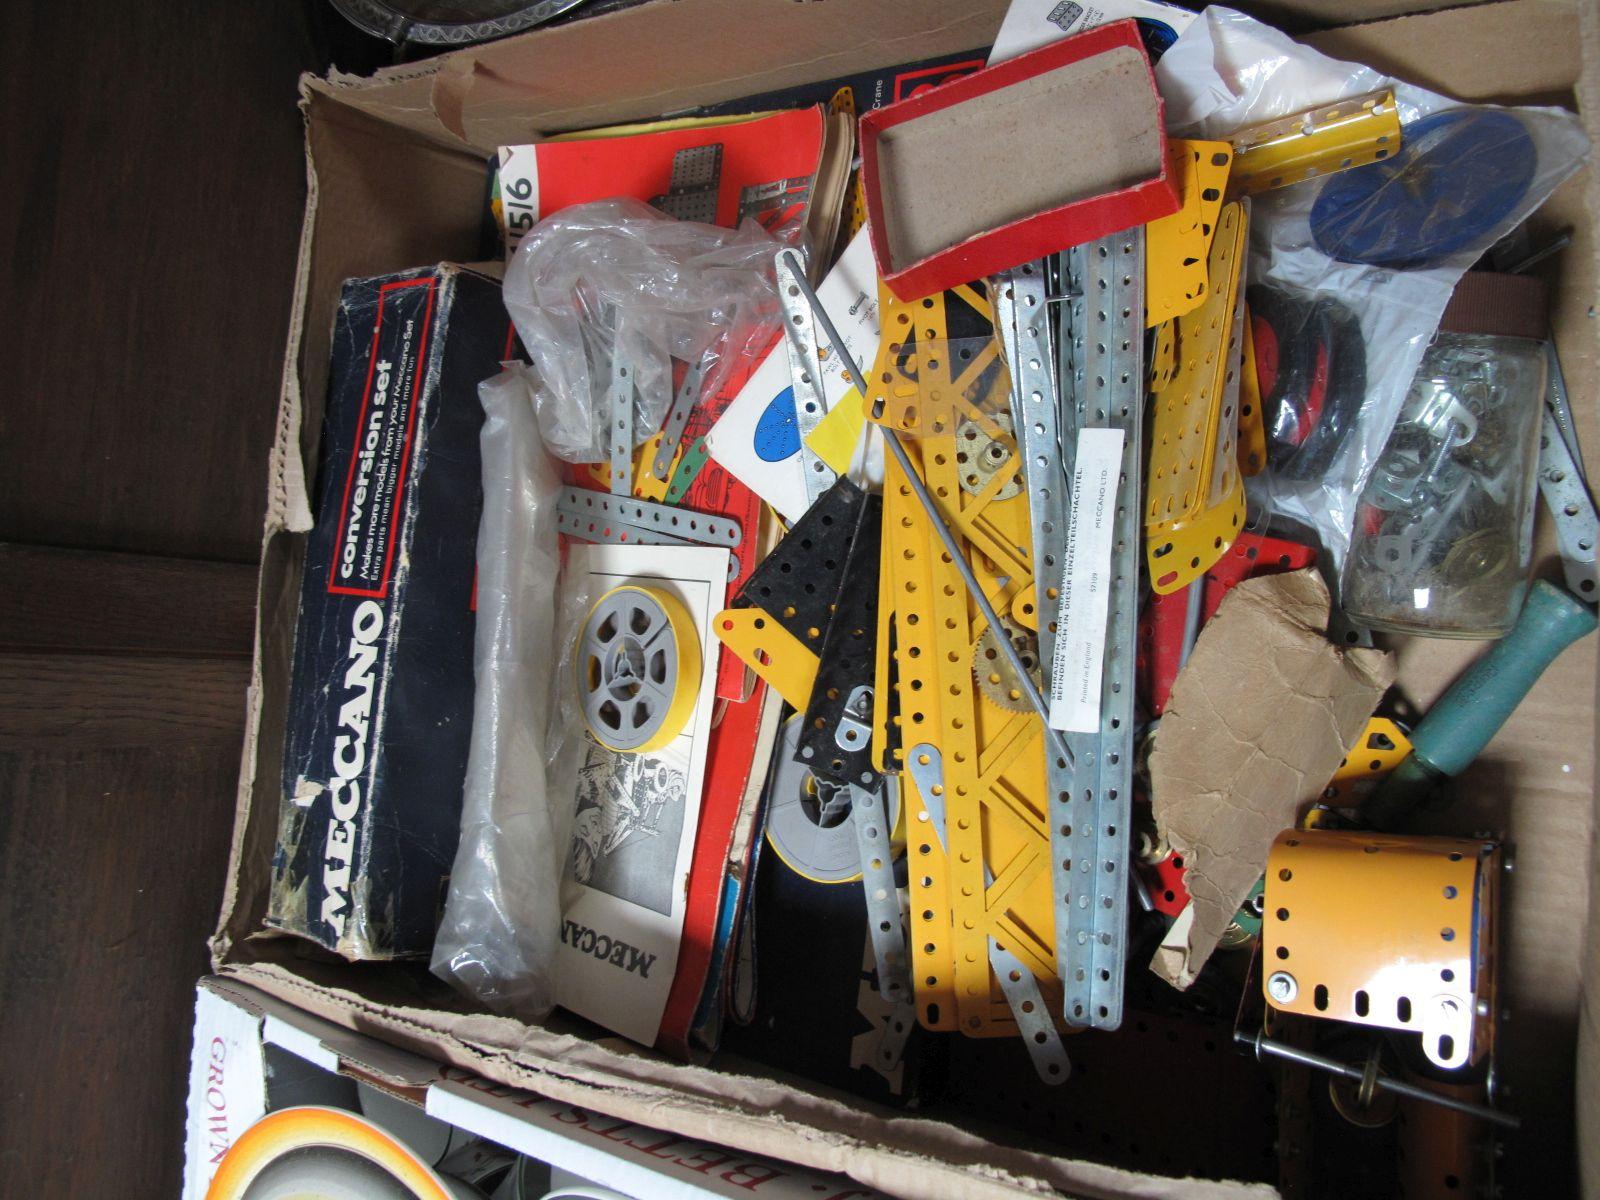 Lot 51 - Meccano Conversion Set, construction set and accessories:- One Box